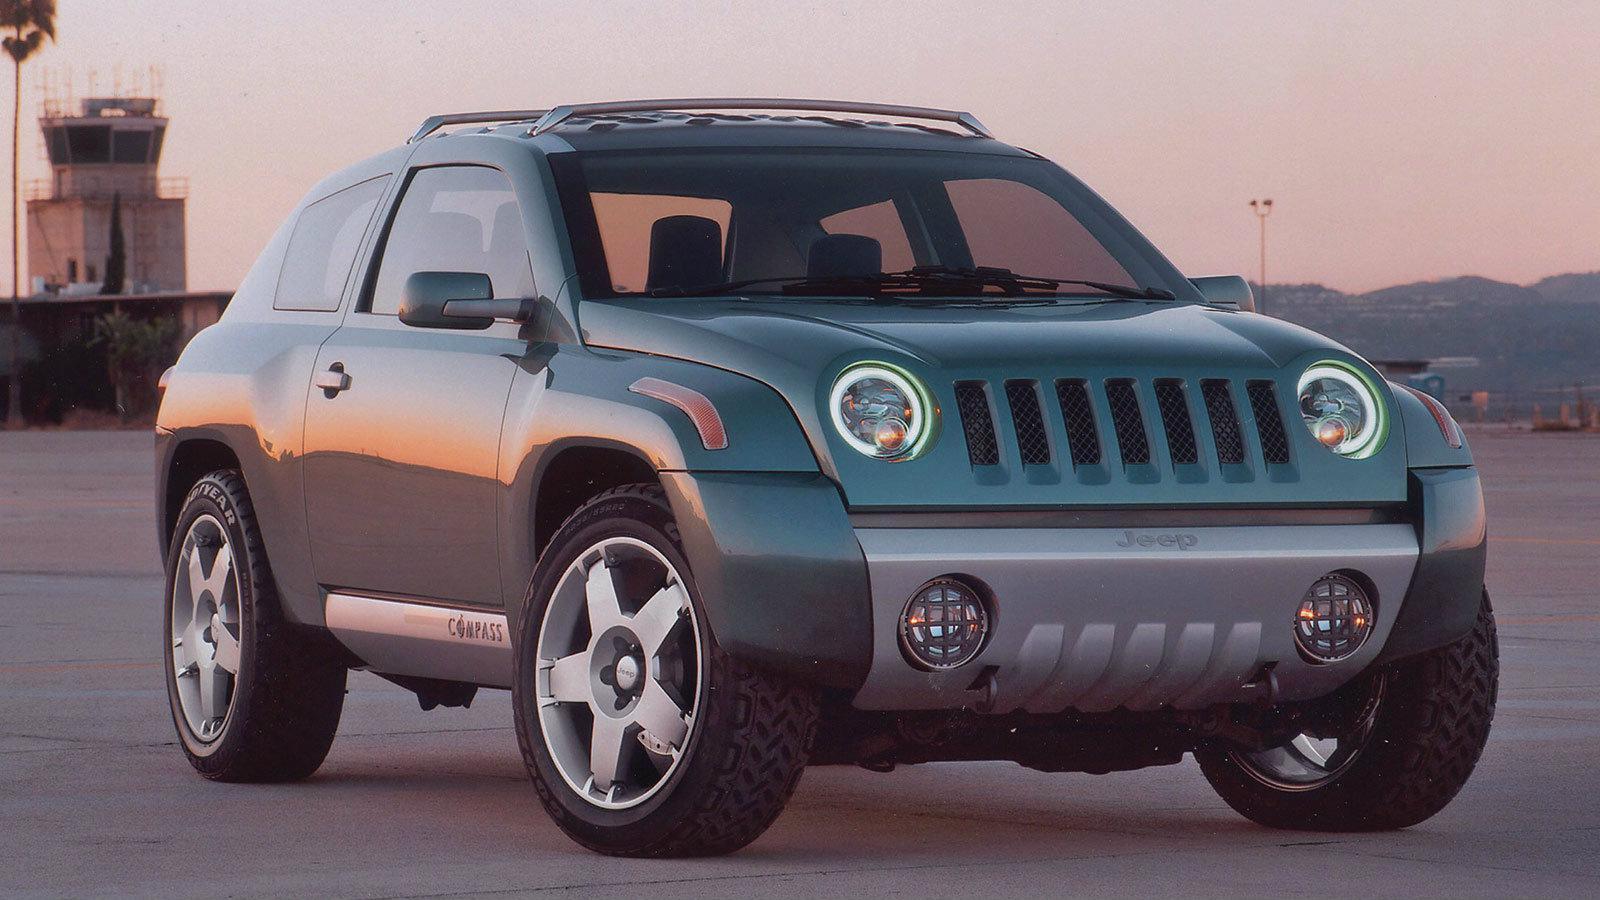 jeep compass grand cherokee jeep compa. Black Bedroom Furniture Sets. Home Design Ideas